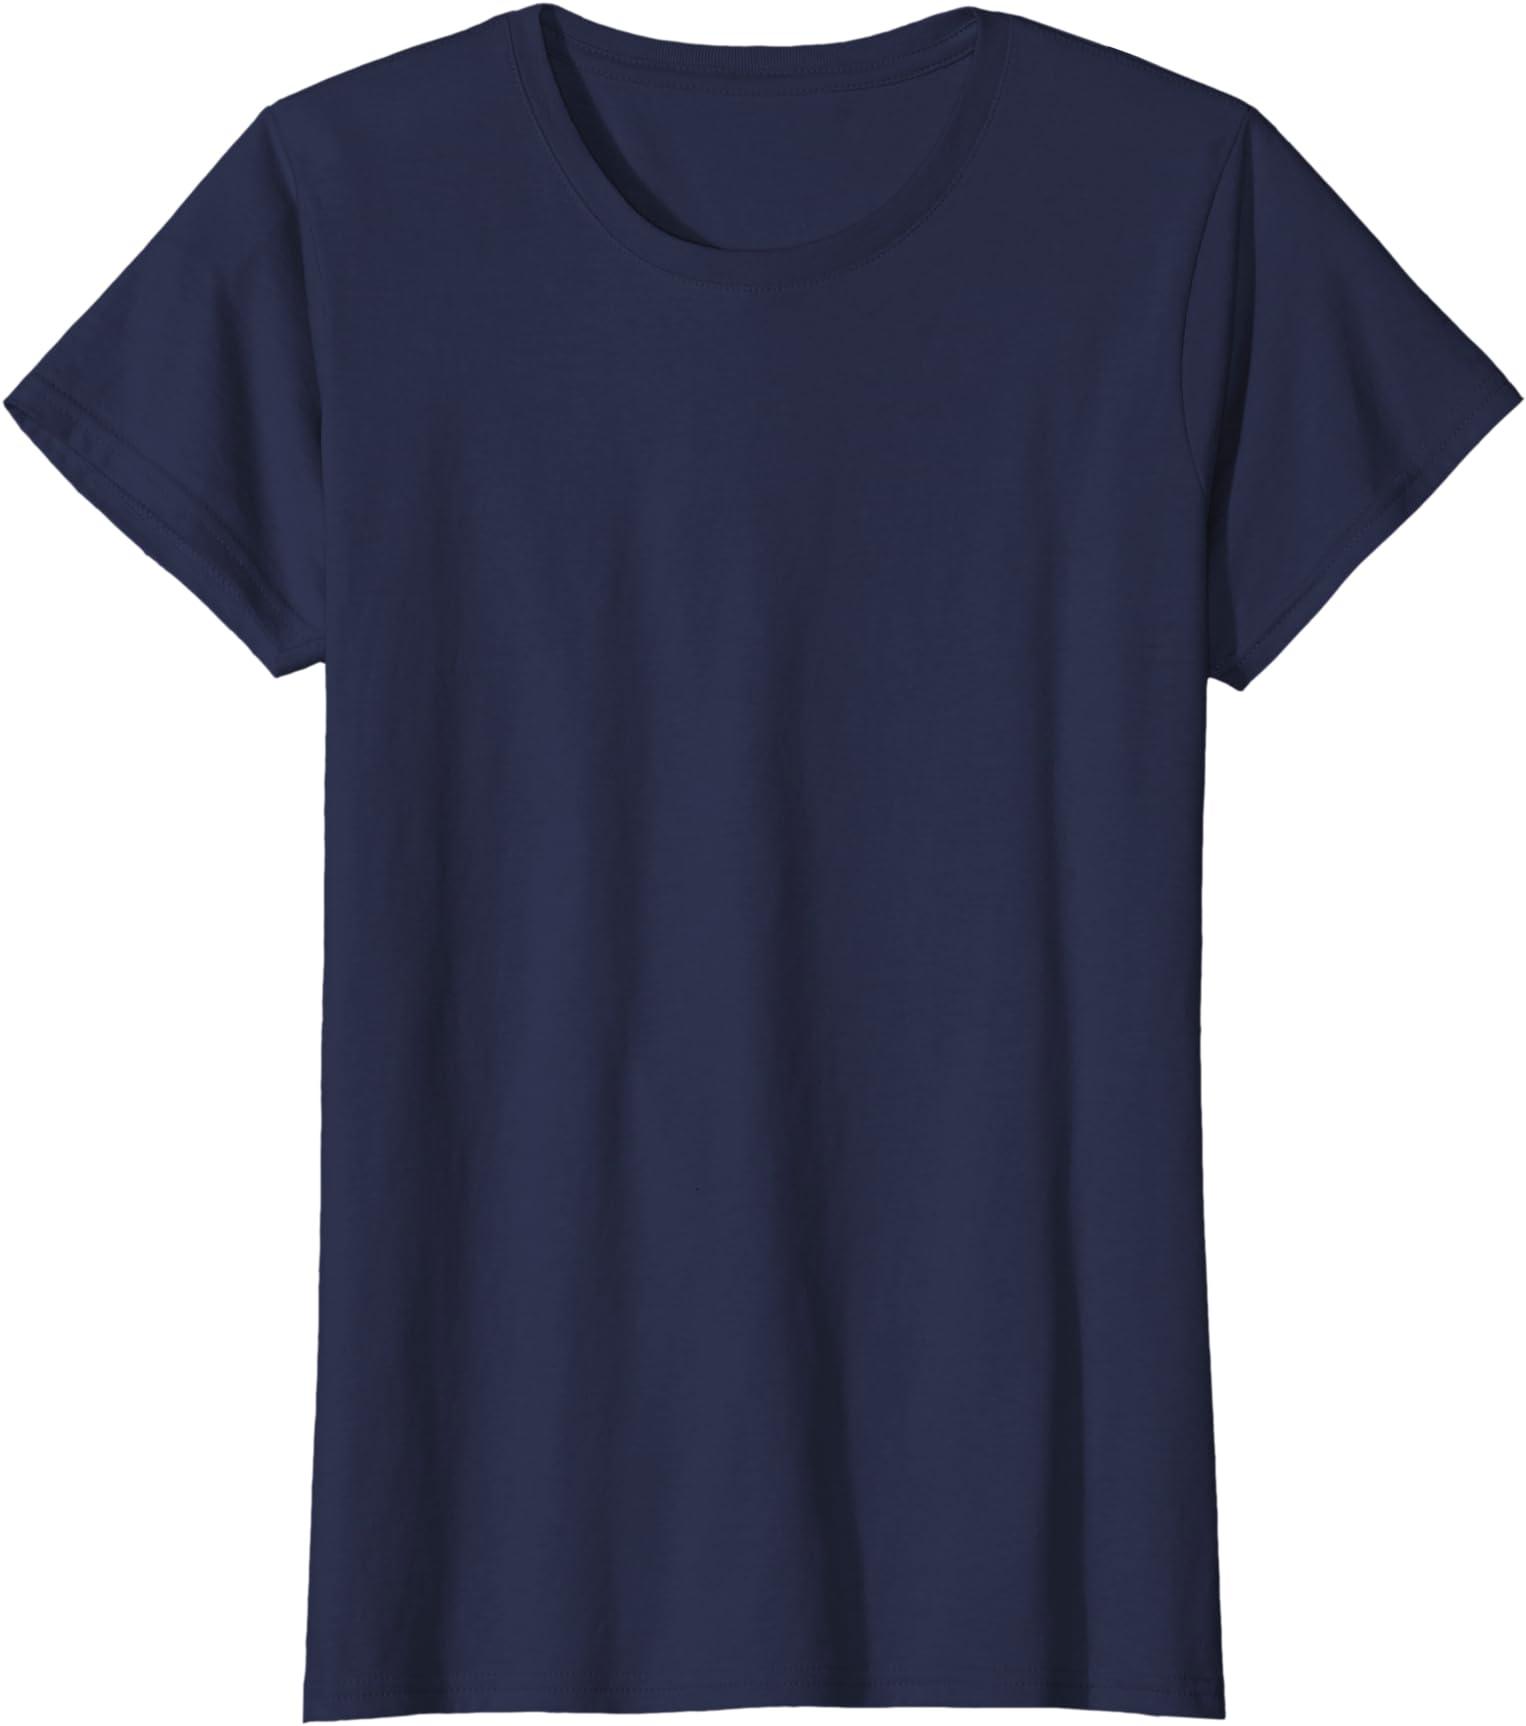 Machine washable Crazy Shark Lady Standard Unisex Standard Unisex T-shirt